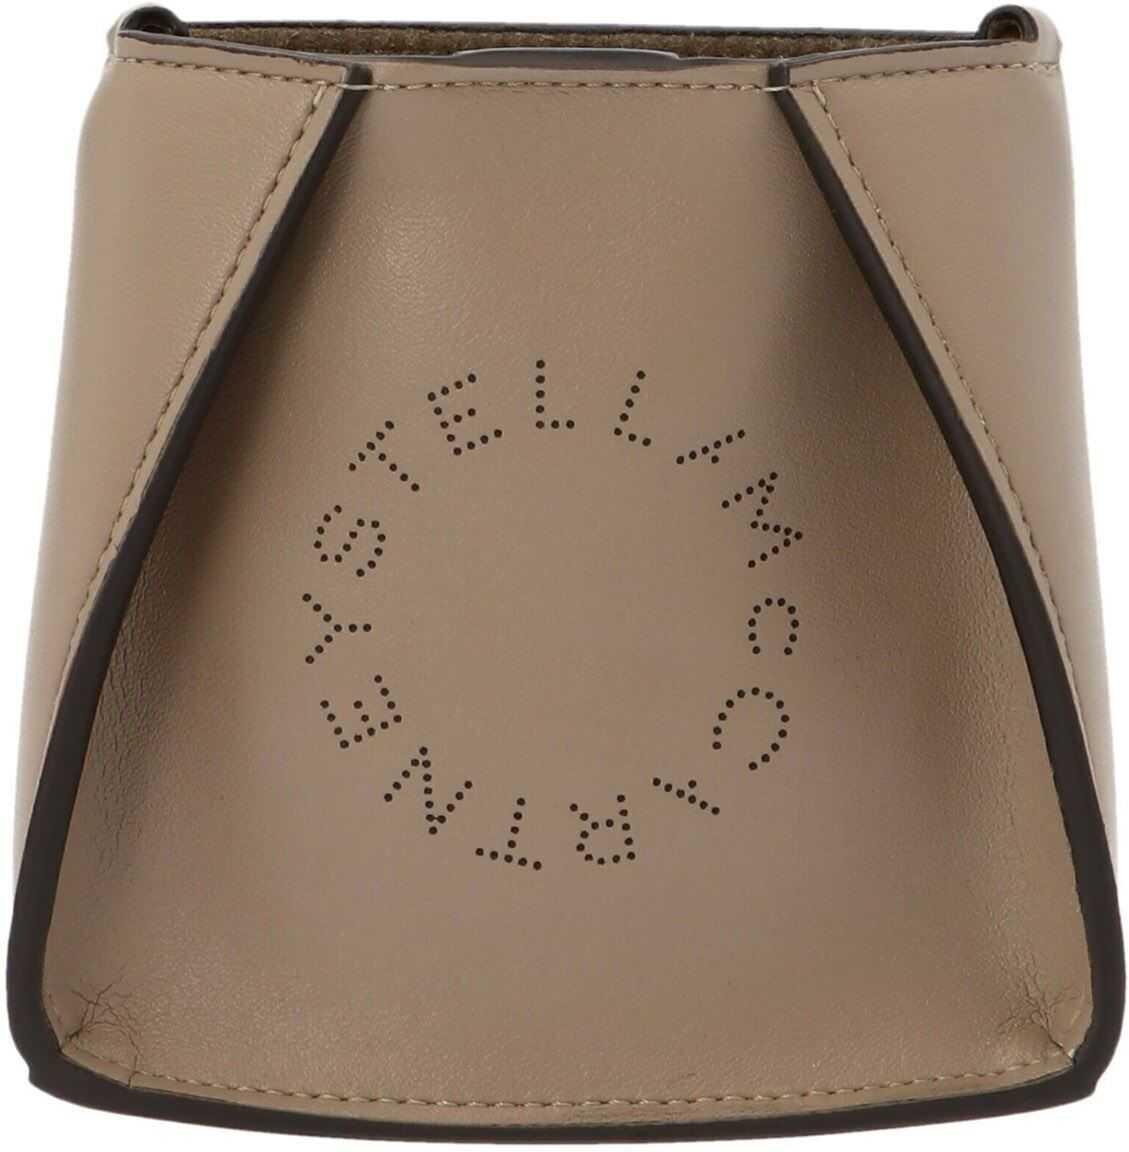 Stella McCartney Micro Bag Crossbody Bag In Beige 700159W85422800 Beige imagine b-mall.ro